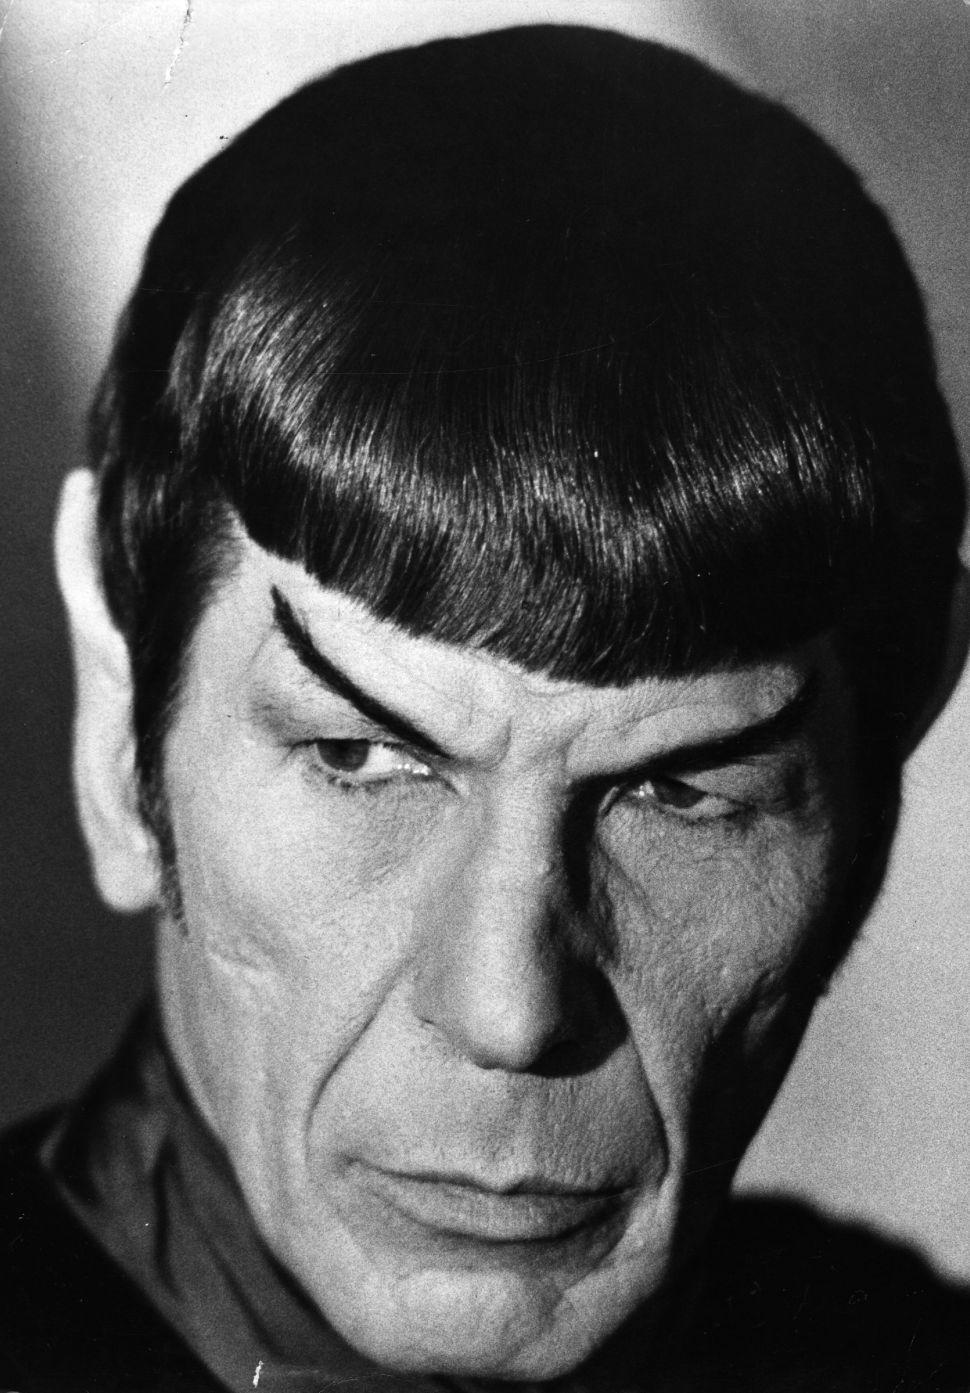 Presidential Prerequisite: Must Love Spock